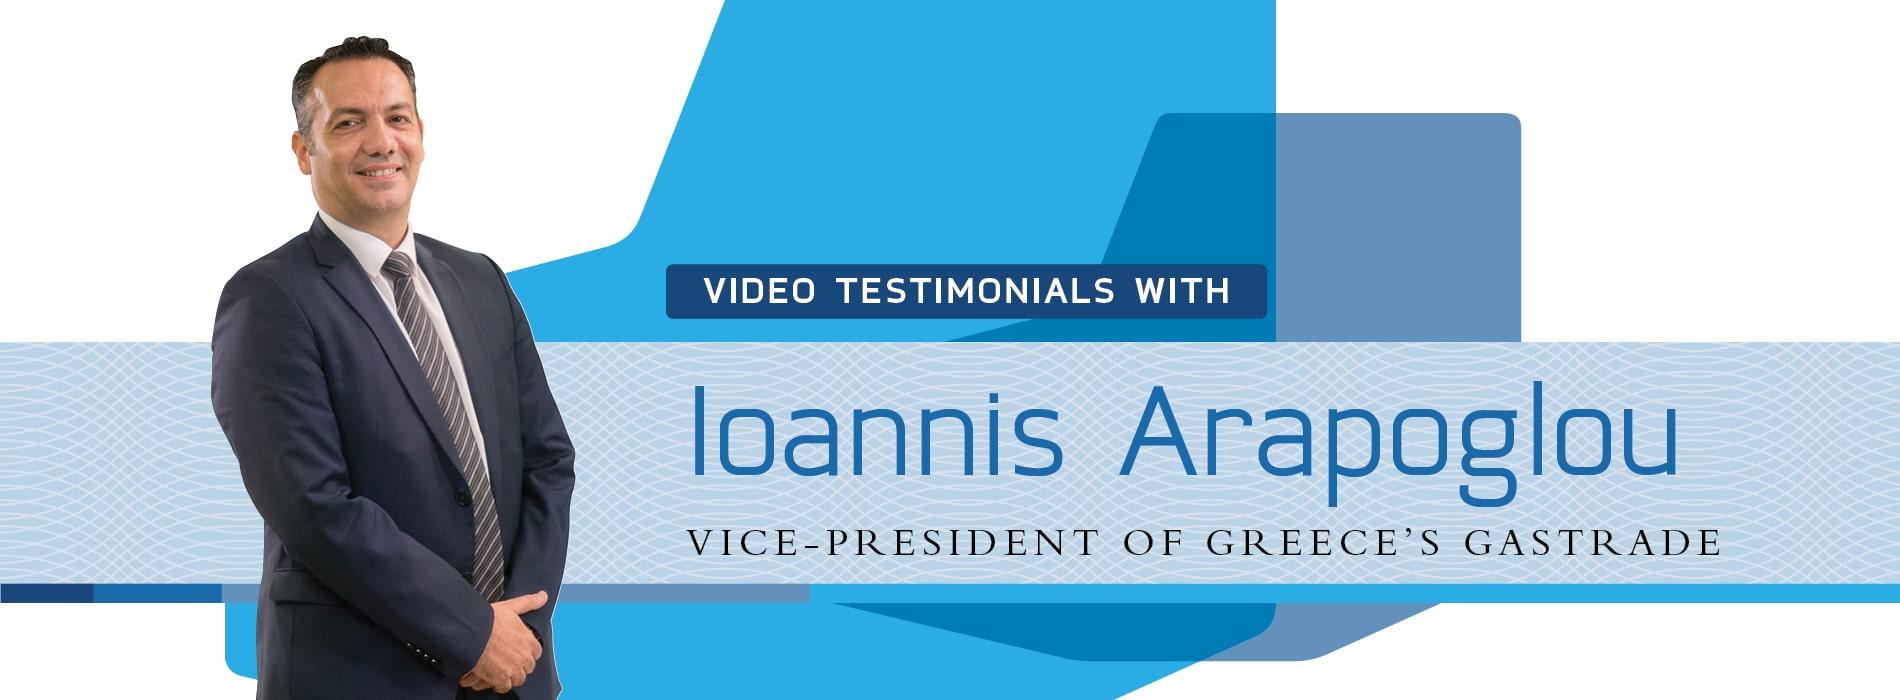 Testimonial Videos: Ioannis Arapoglou, Vice-President of Gastrade